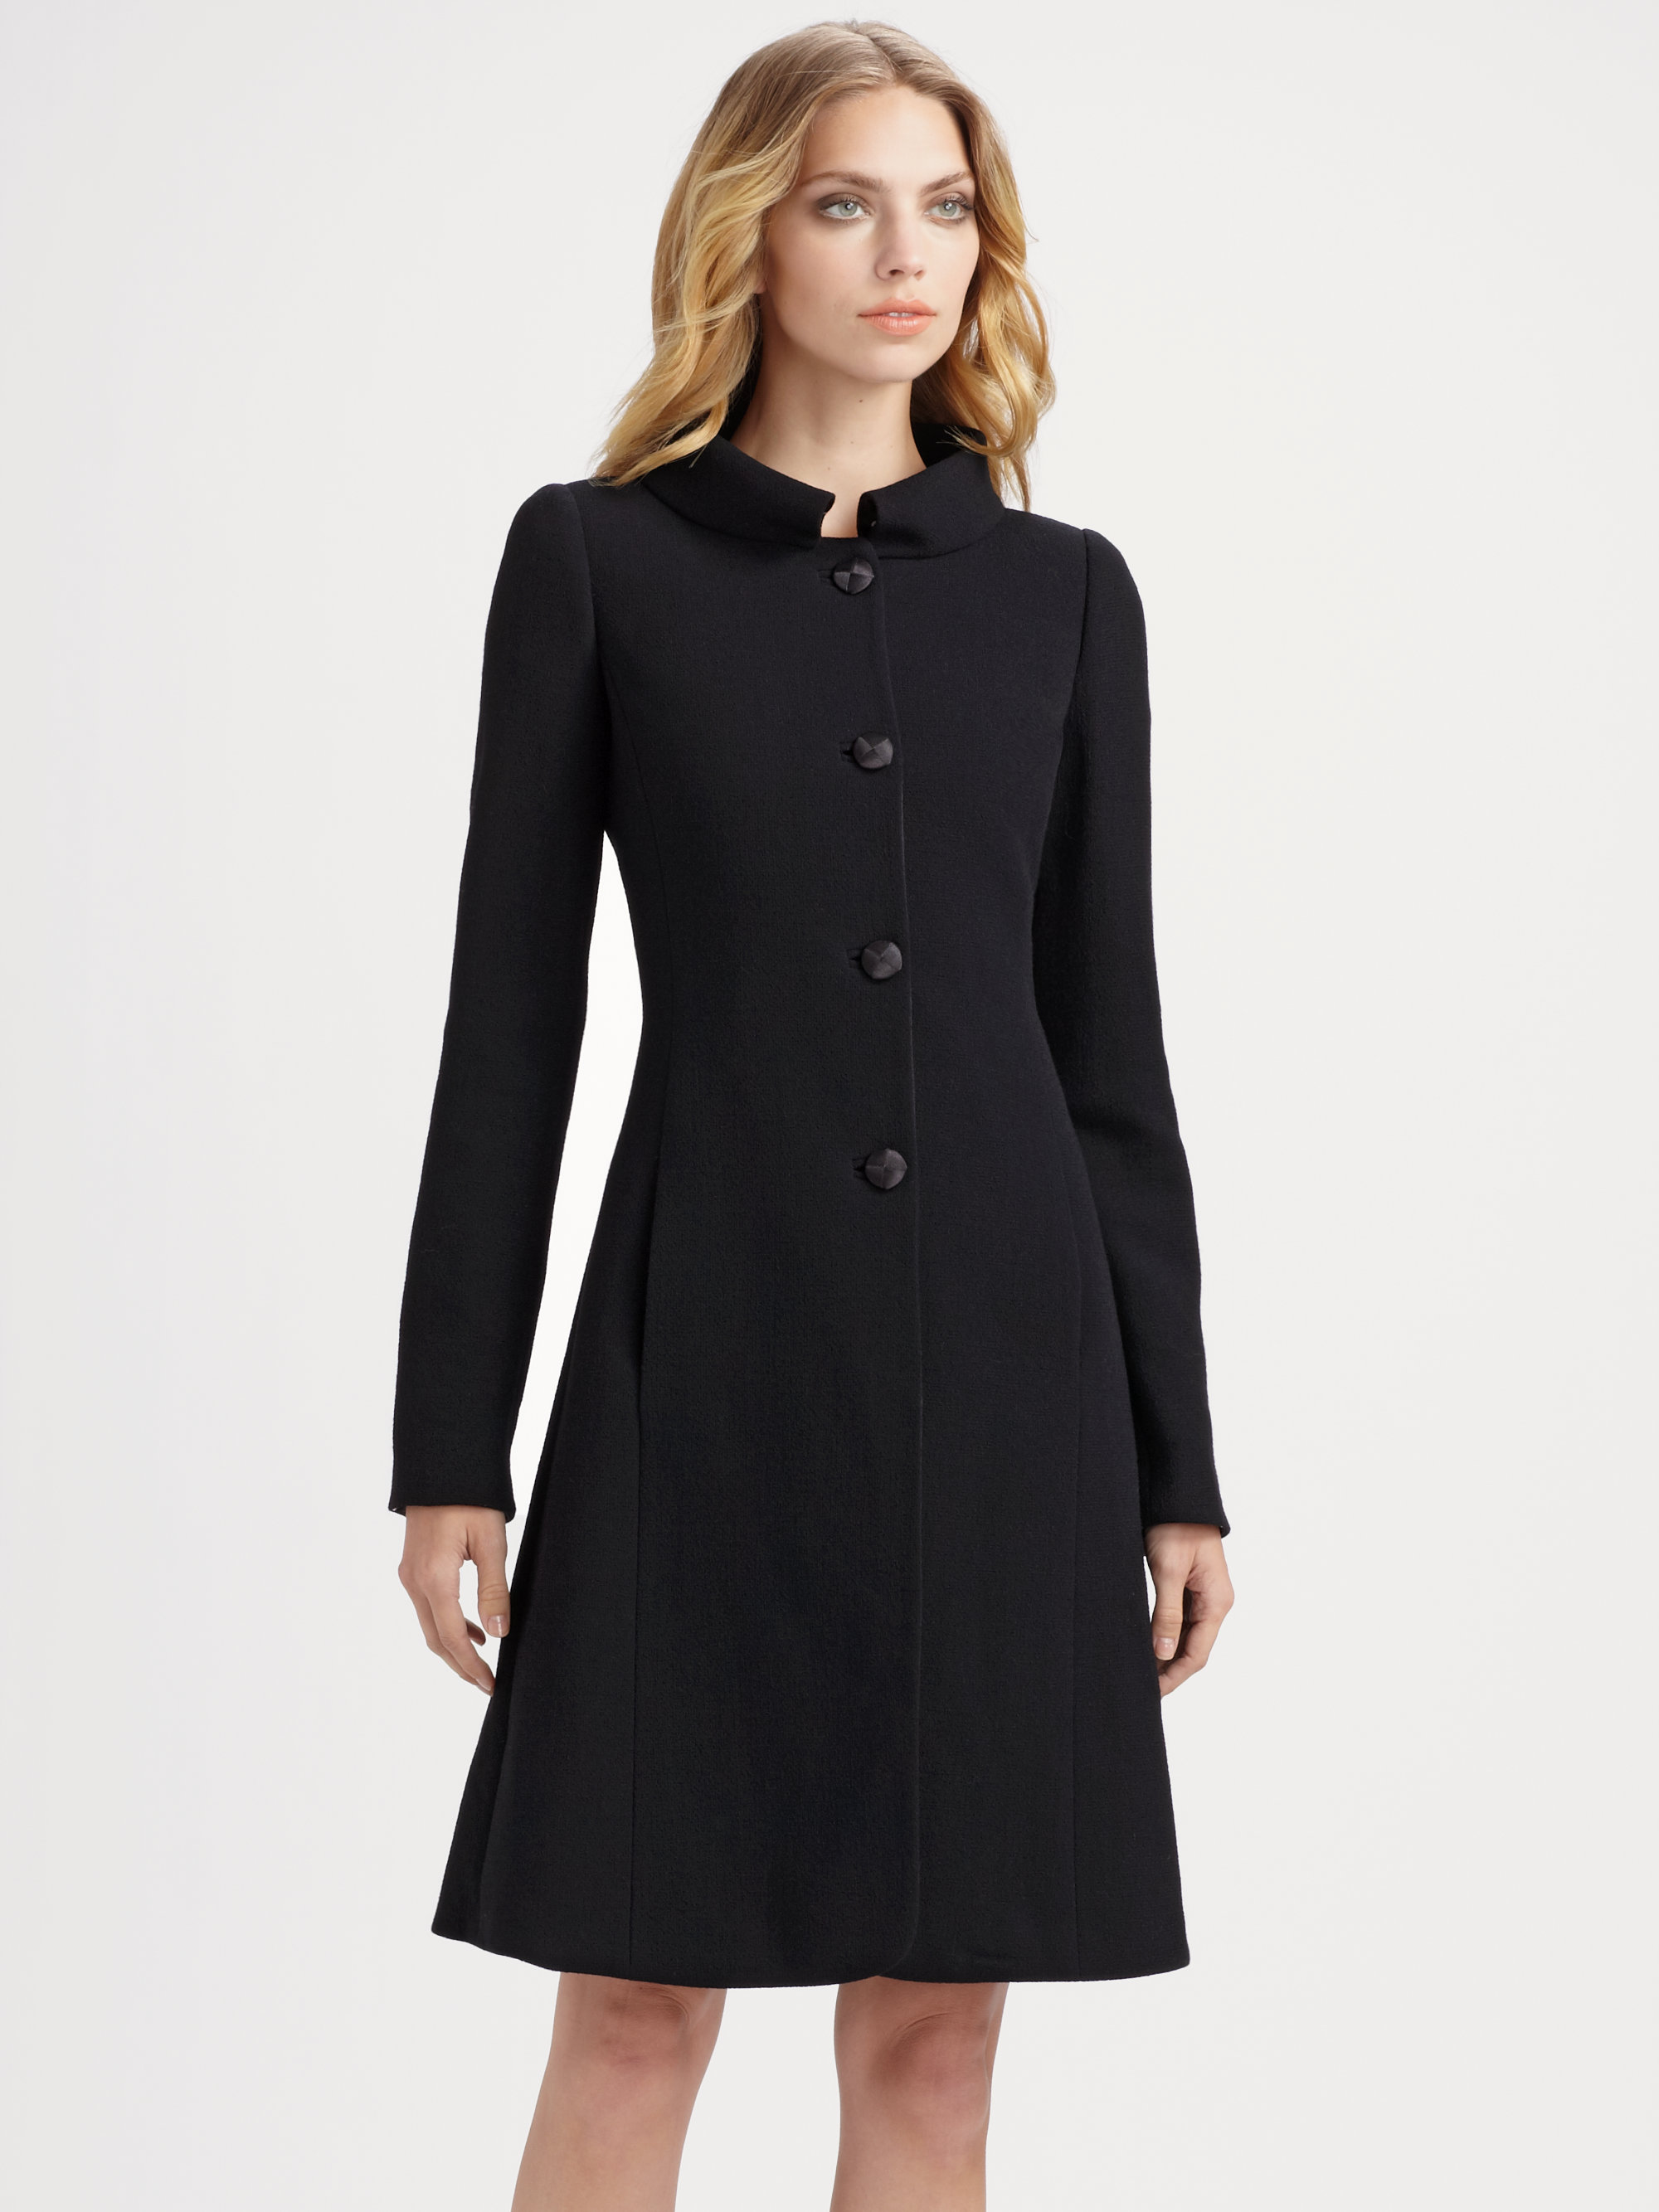 Armani Wool Crepe Coat In Black Lyst